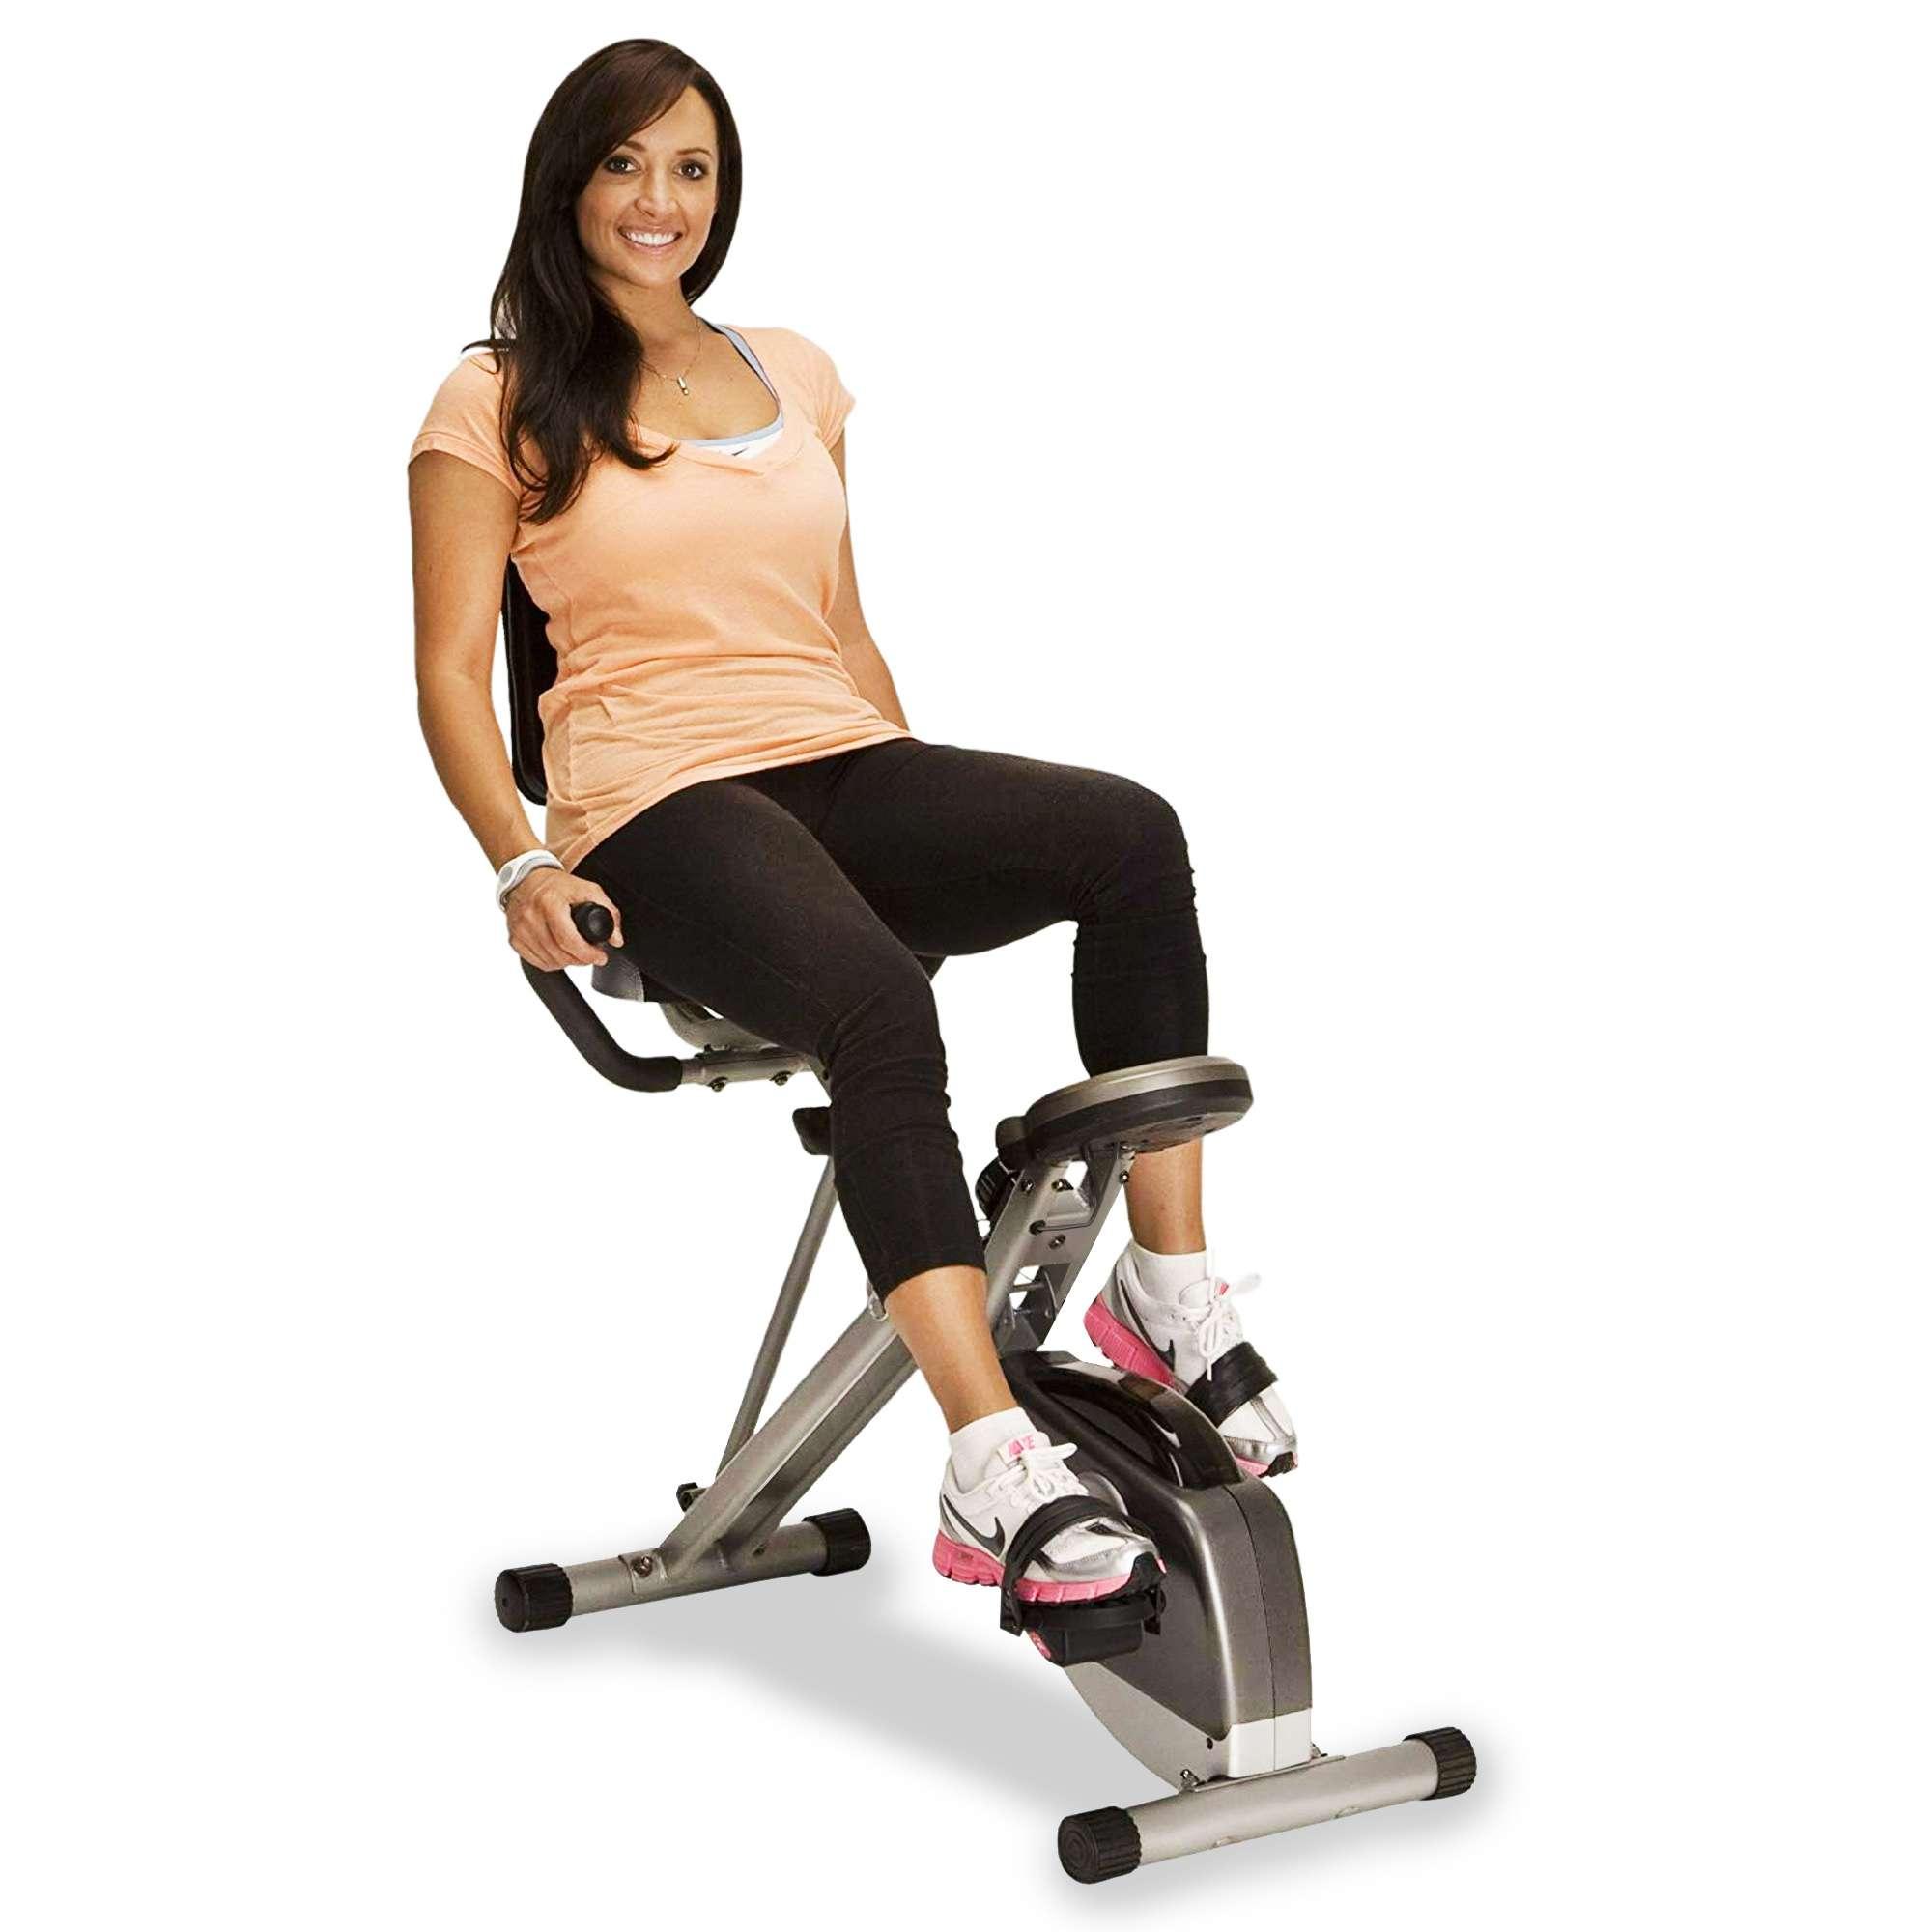 Bicicleta estática reclinada plegable plegable Exerpeutic con pulso